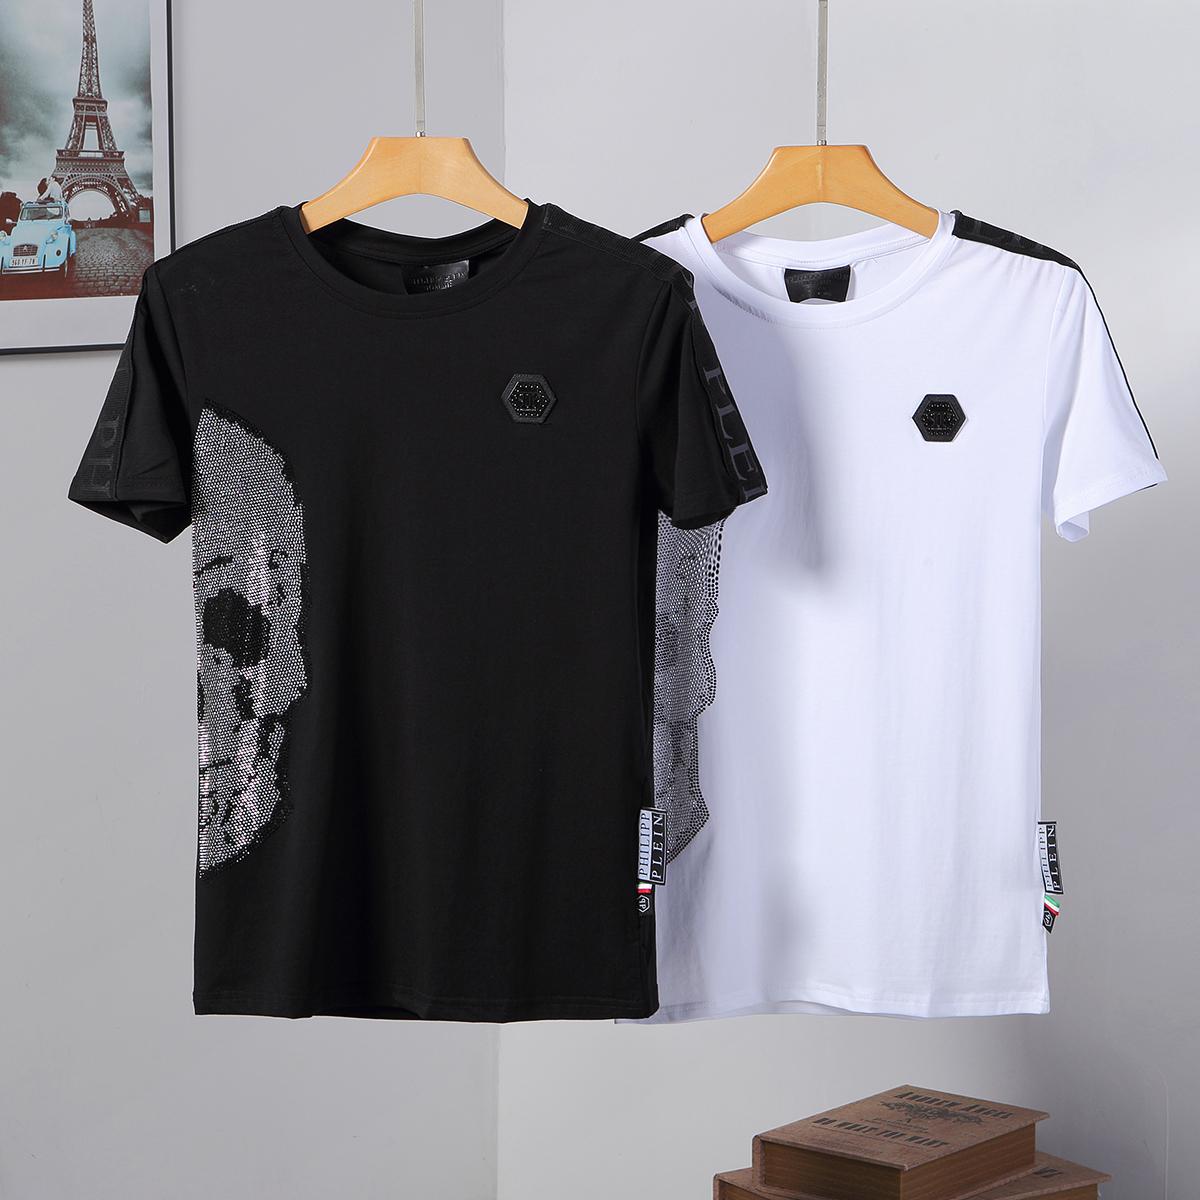 PHILIPP PLEIN Black Letters Men Casual Anti-Collar T-shirt P888002# Size M-3XL